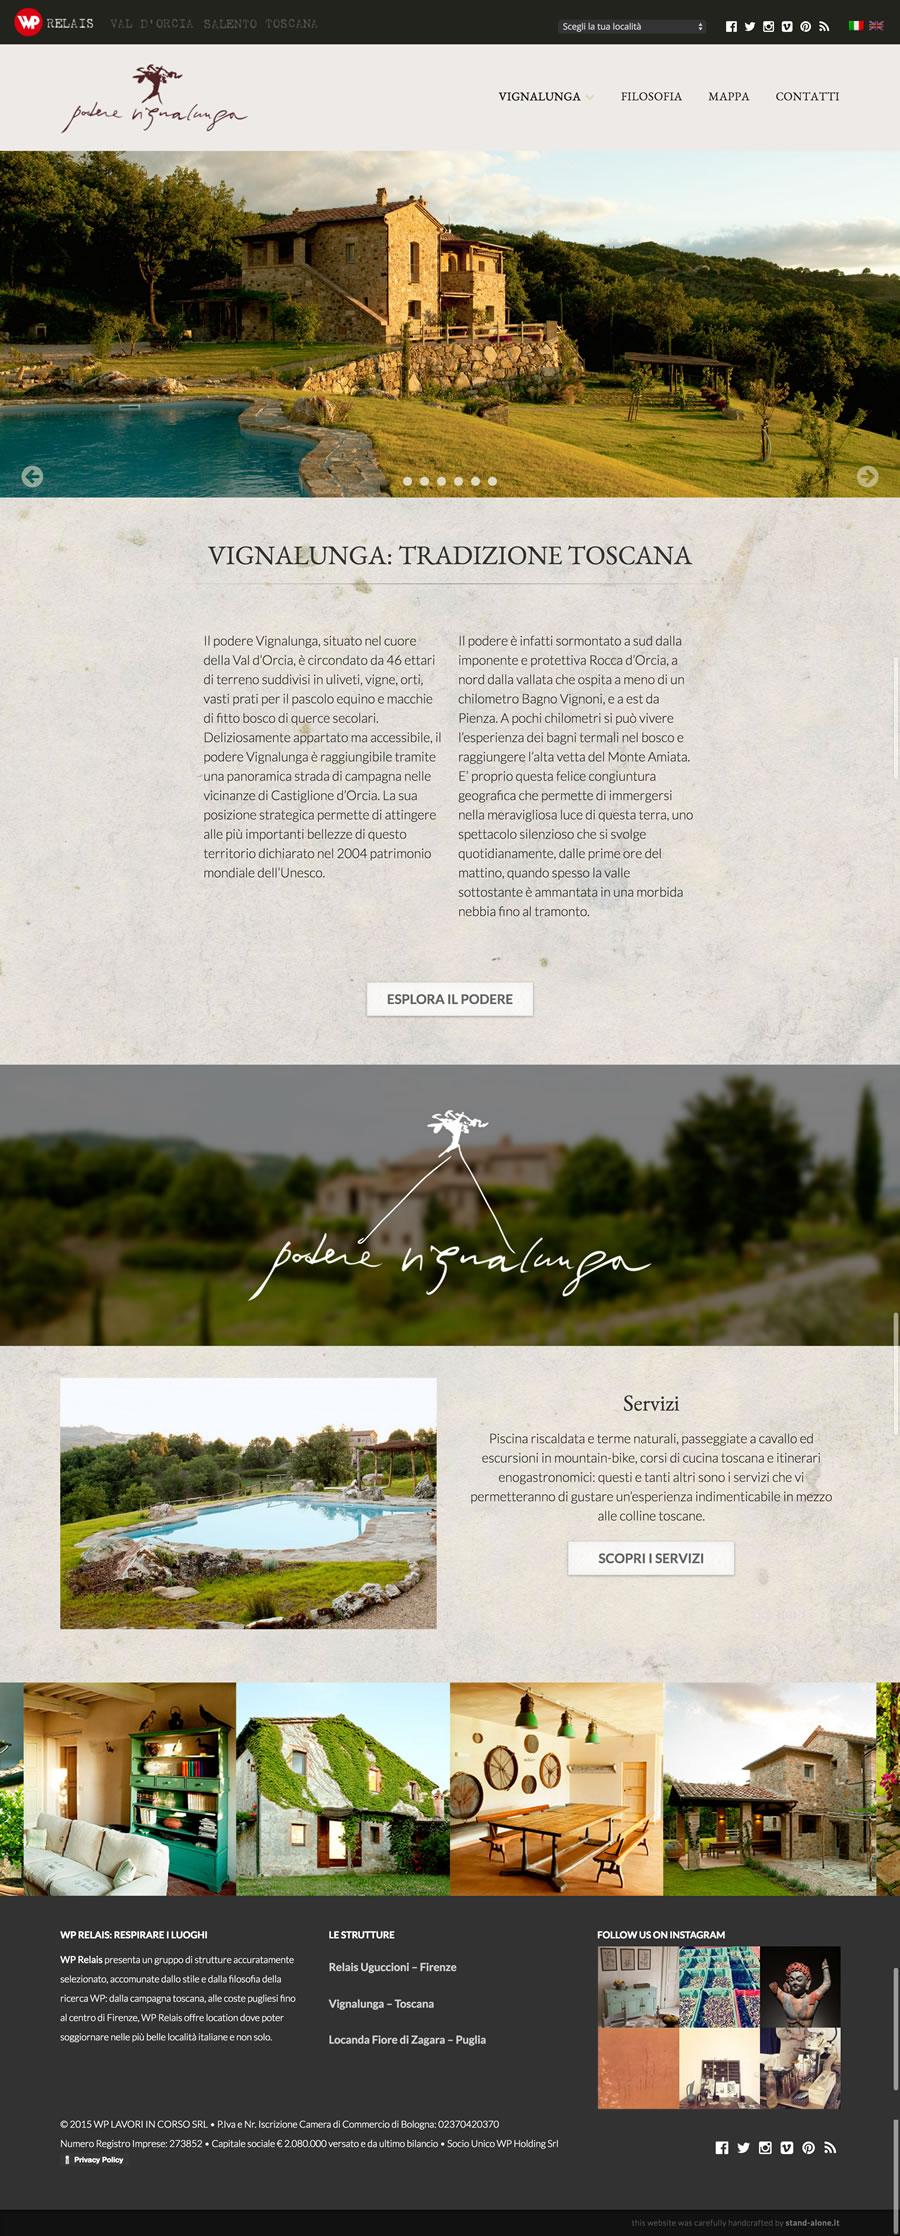 Vignalunga   Toscana   WP Relais